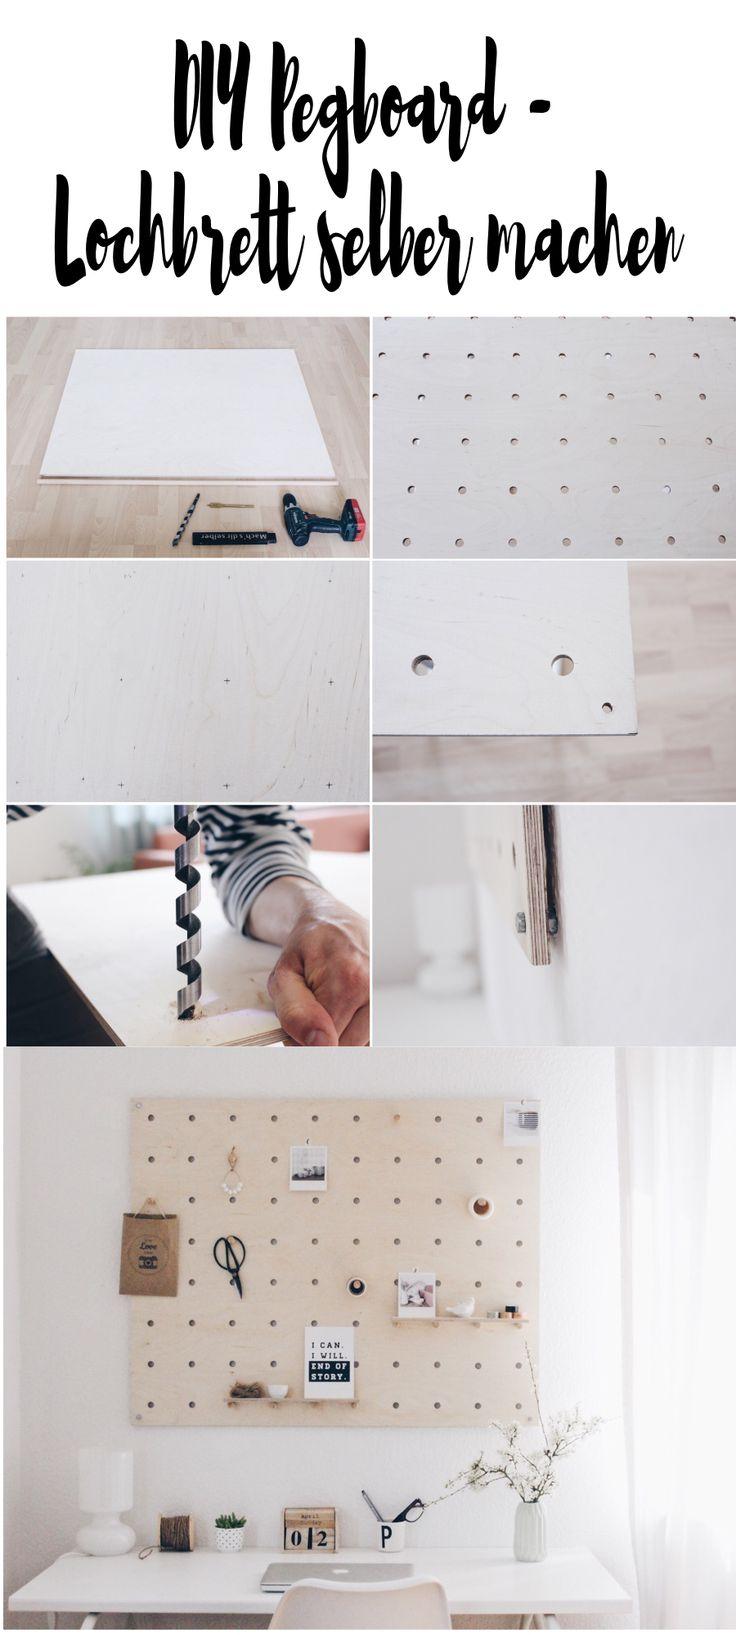 Die besten 25 pinnwand selber machen ideen auf pinterest - Ideen fur pinnwand ...